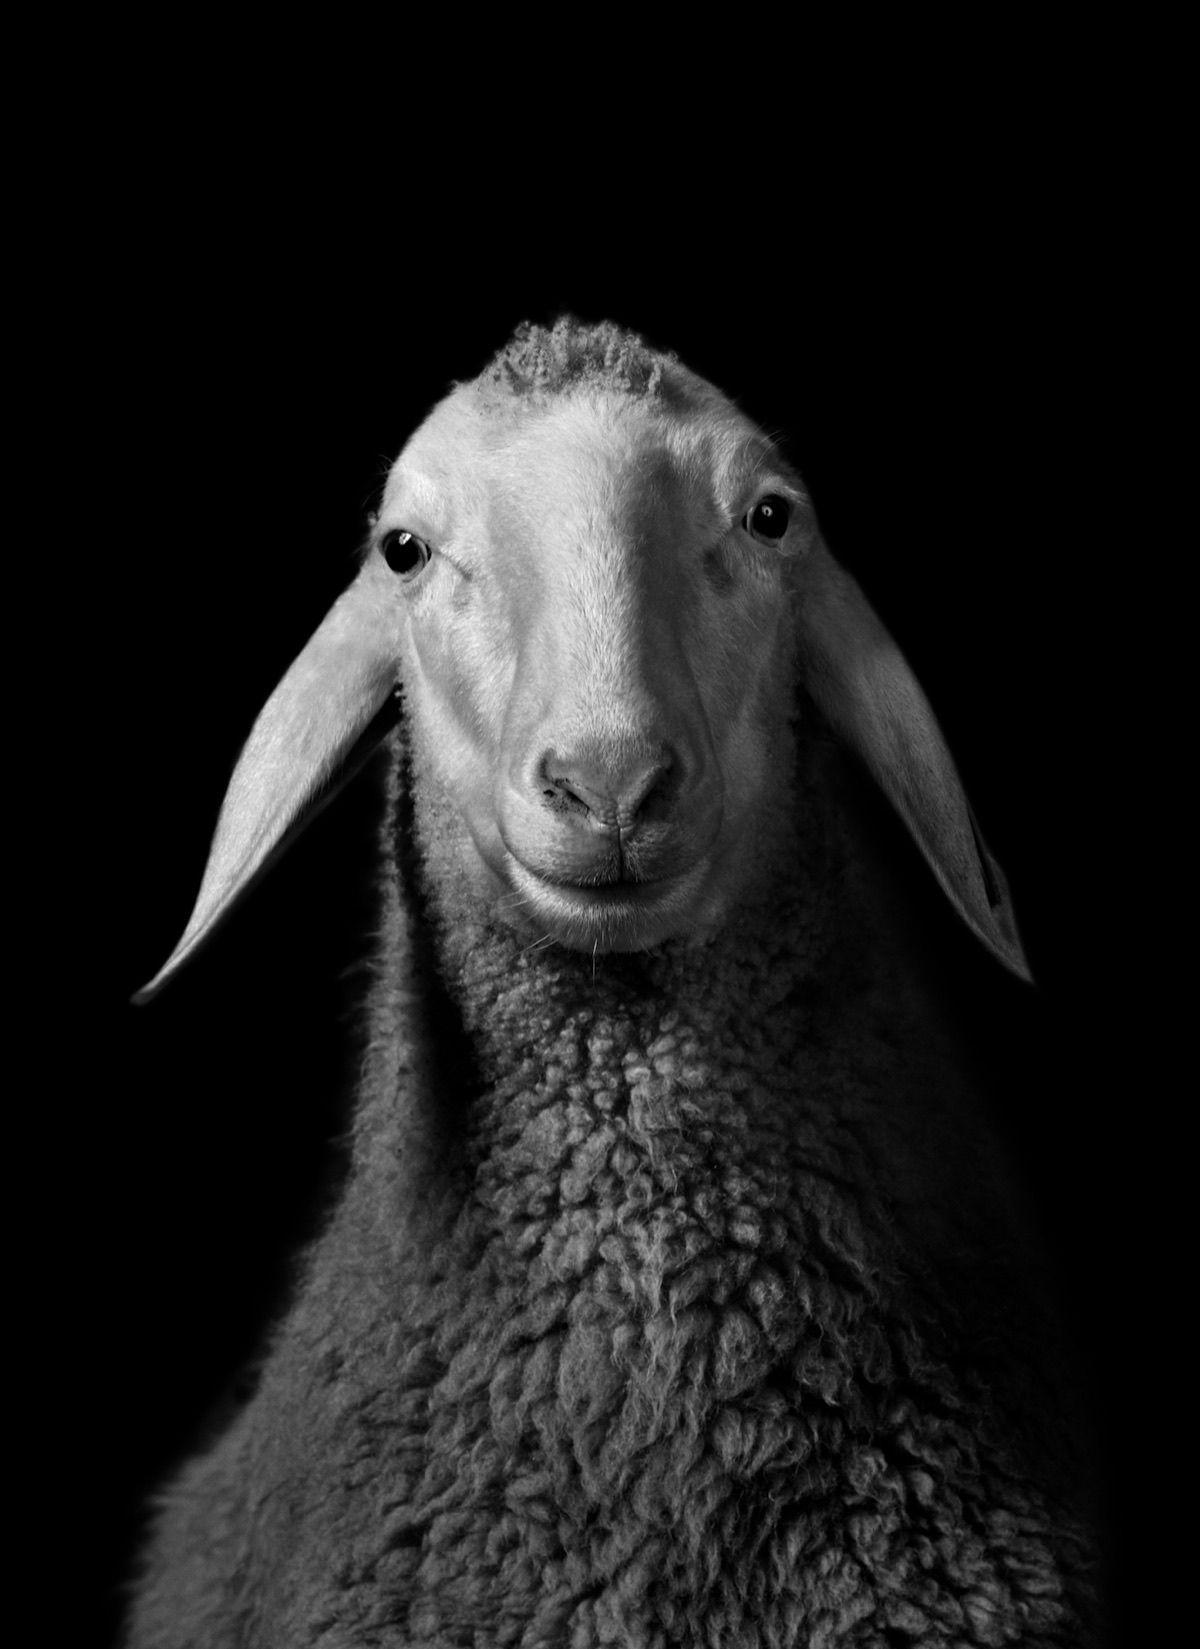 Walter Schels Schaf 1984 Sheep Portraiture